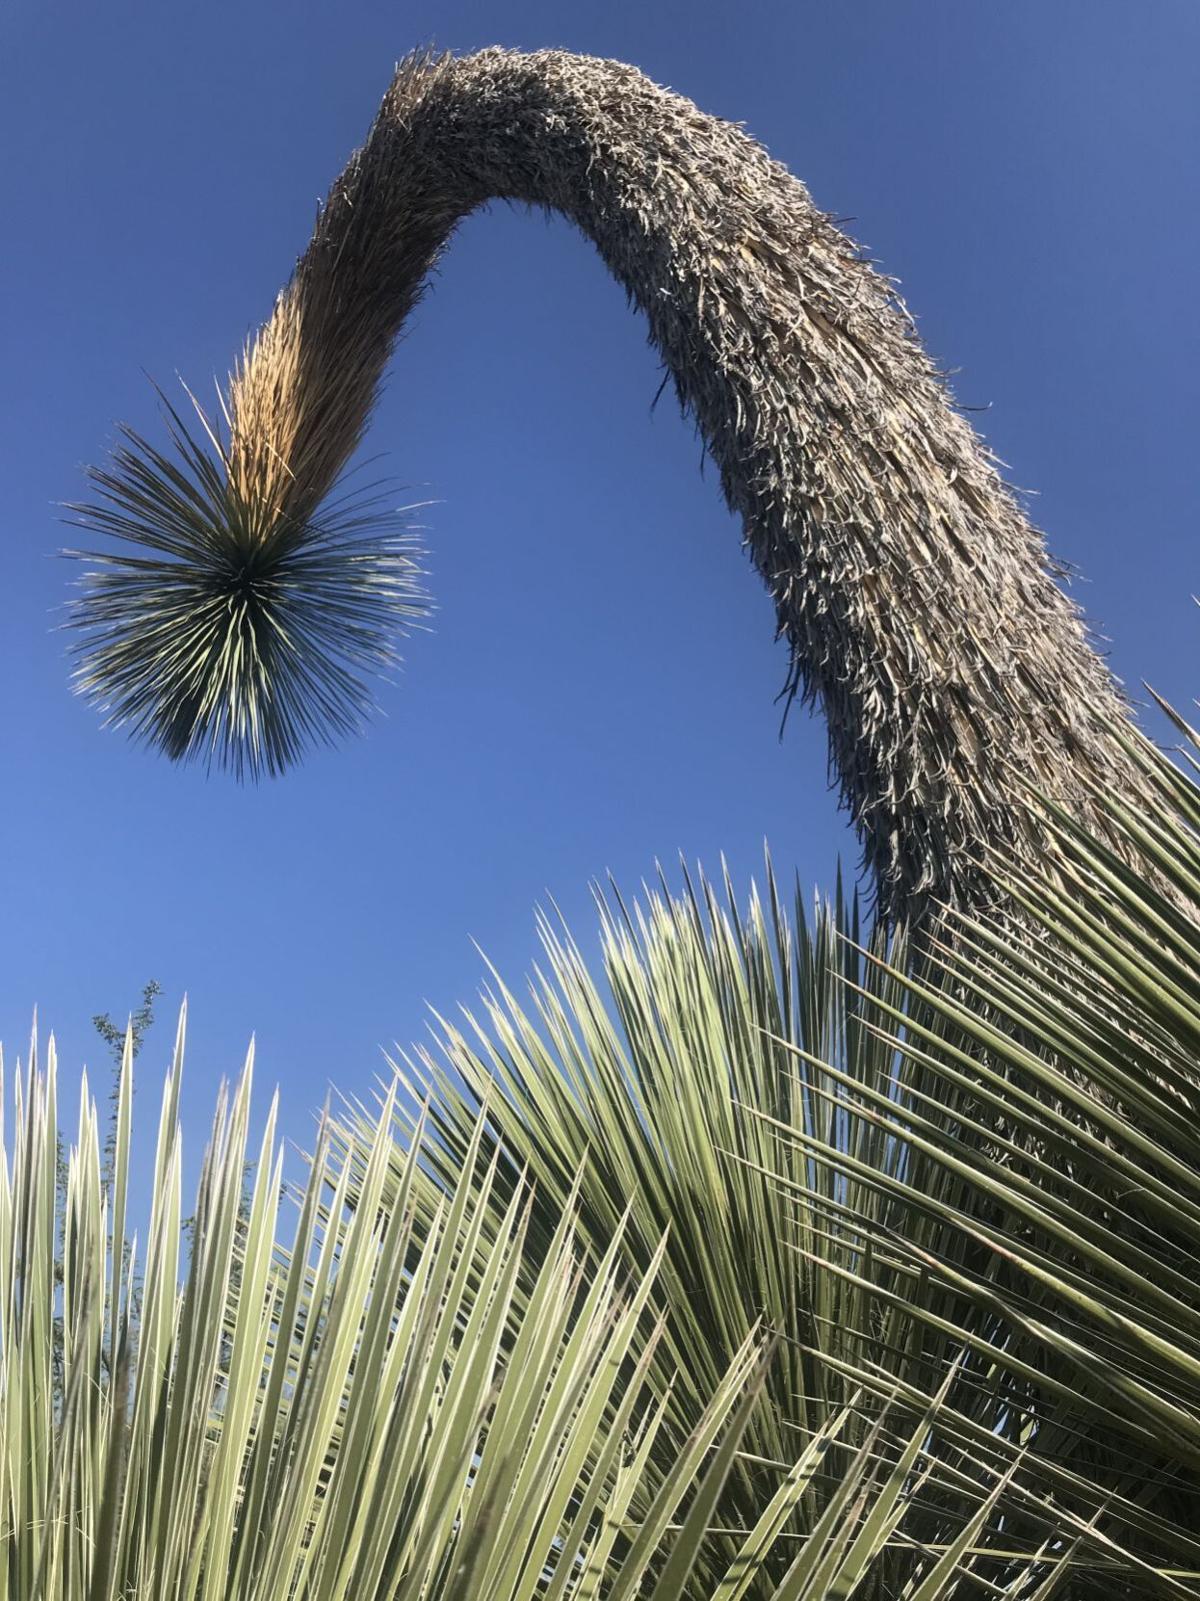 Soaptree yucca plant